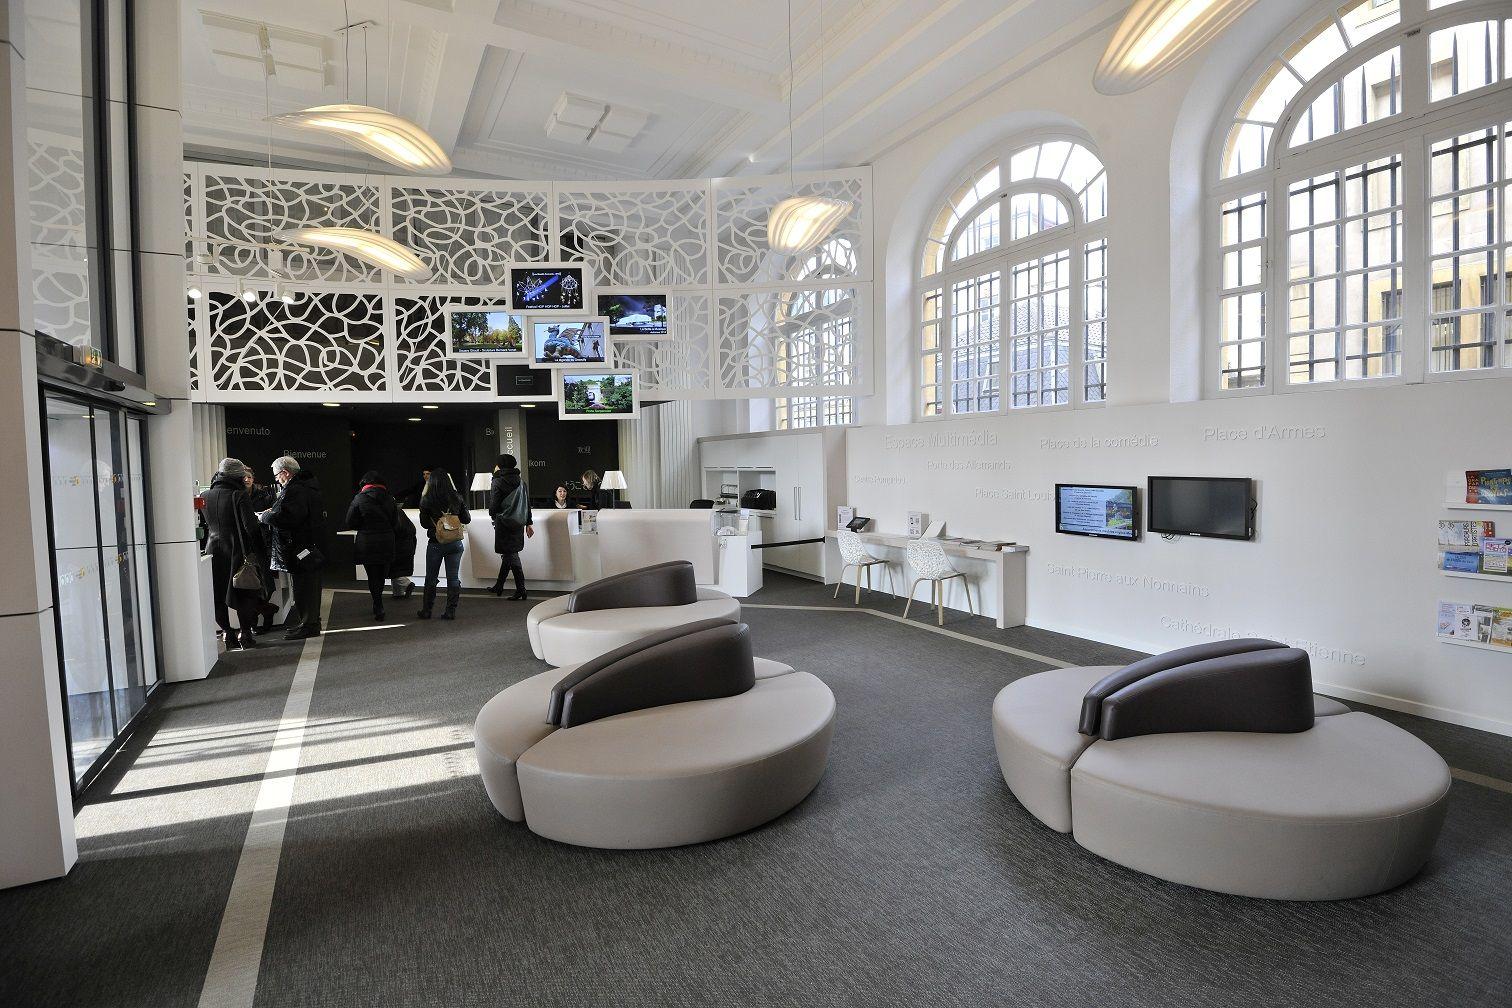 Agence inspire metz office de tourisme de metz lorraine tourisme - Office du tourisme d amsterdam ...